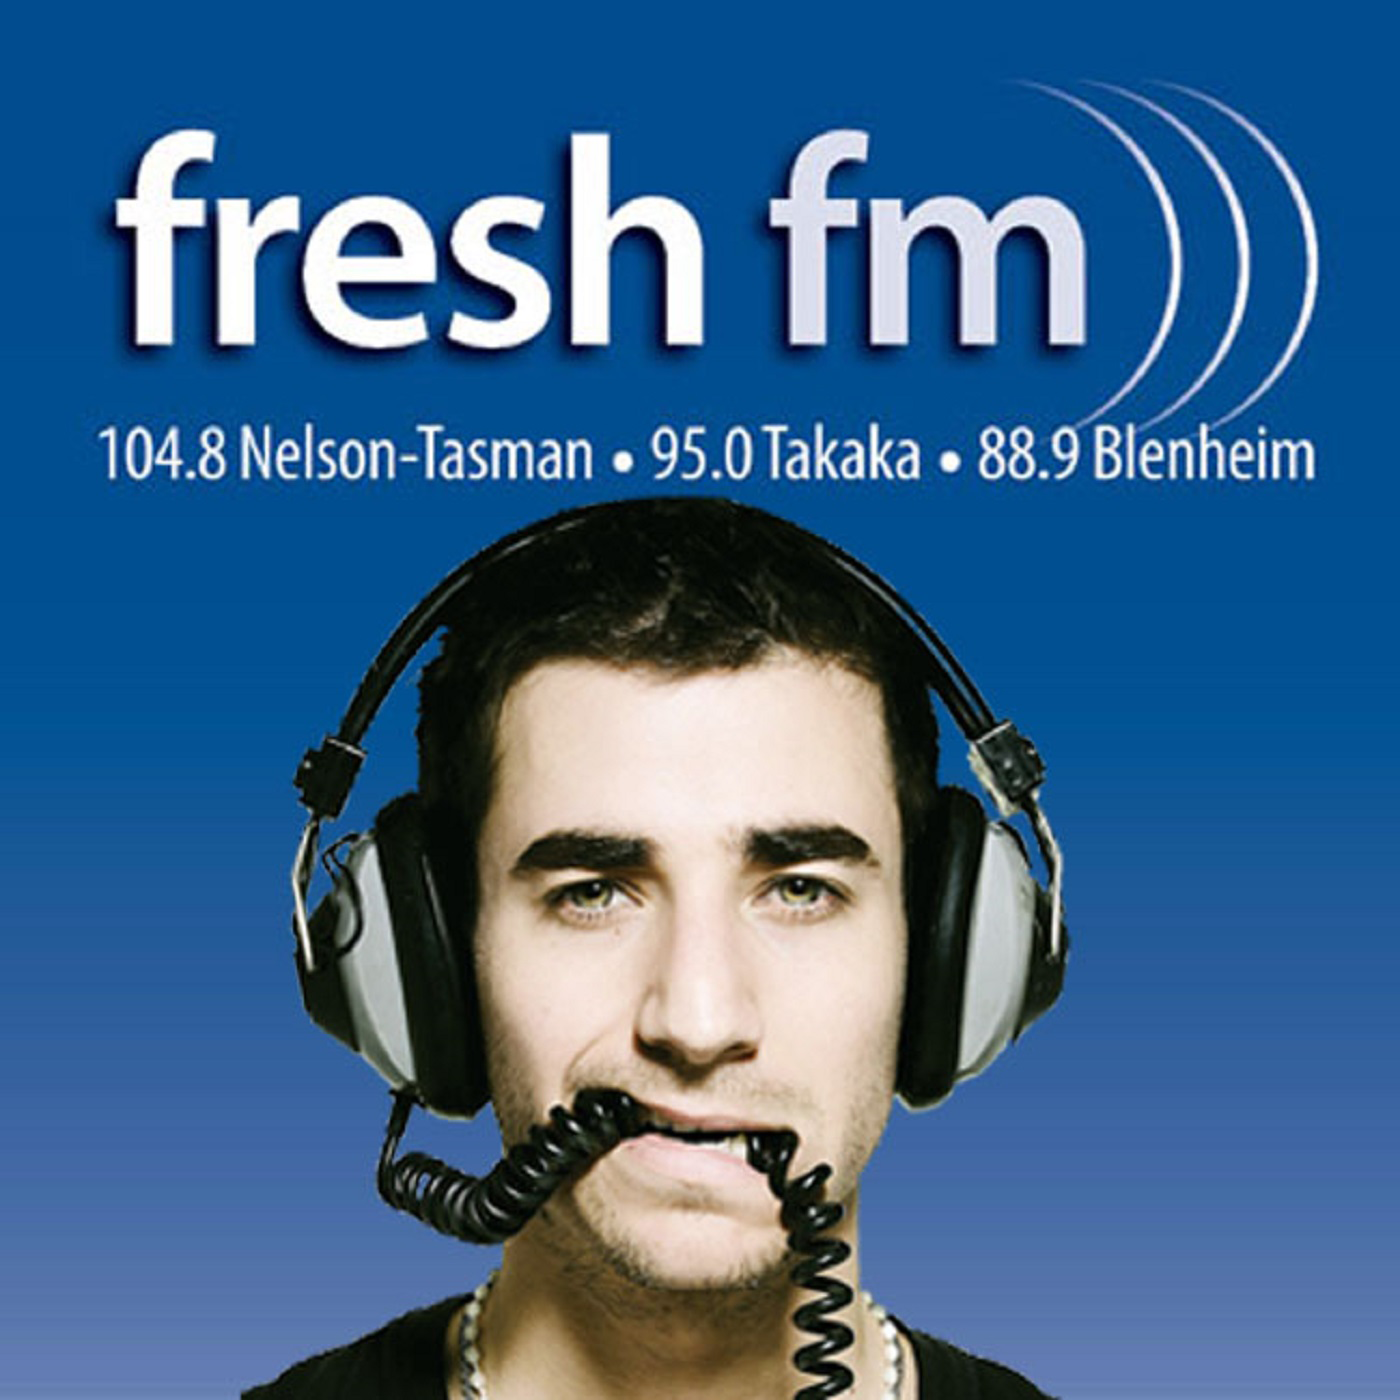 https://cdn.accessradio.org/StationFolder/freshfm/Images/Fresh-FM-Art140078.png